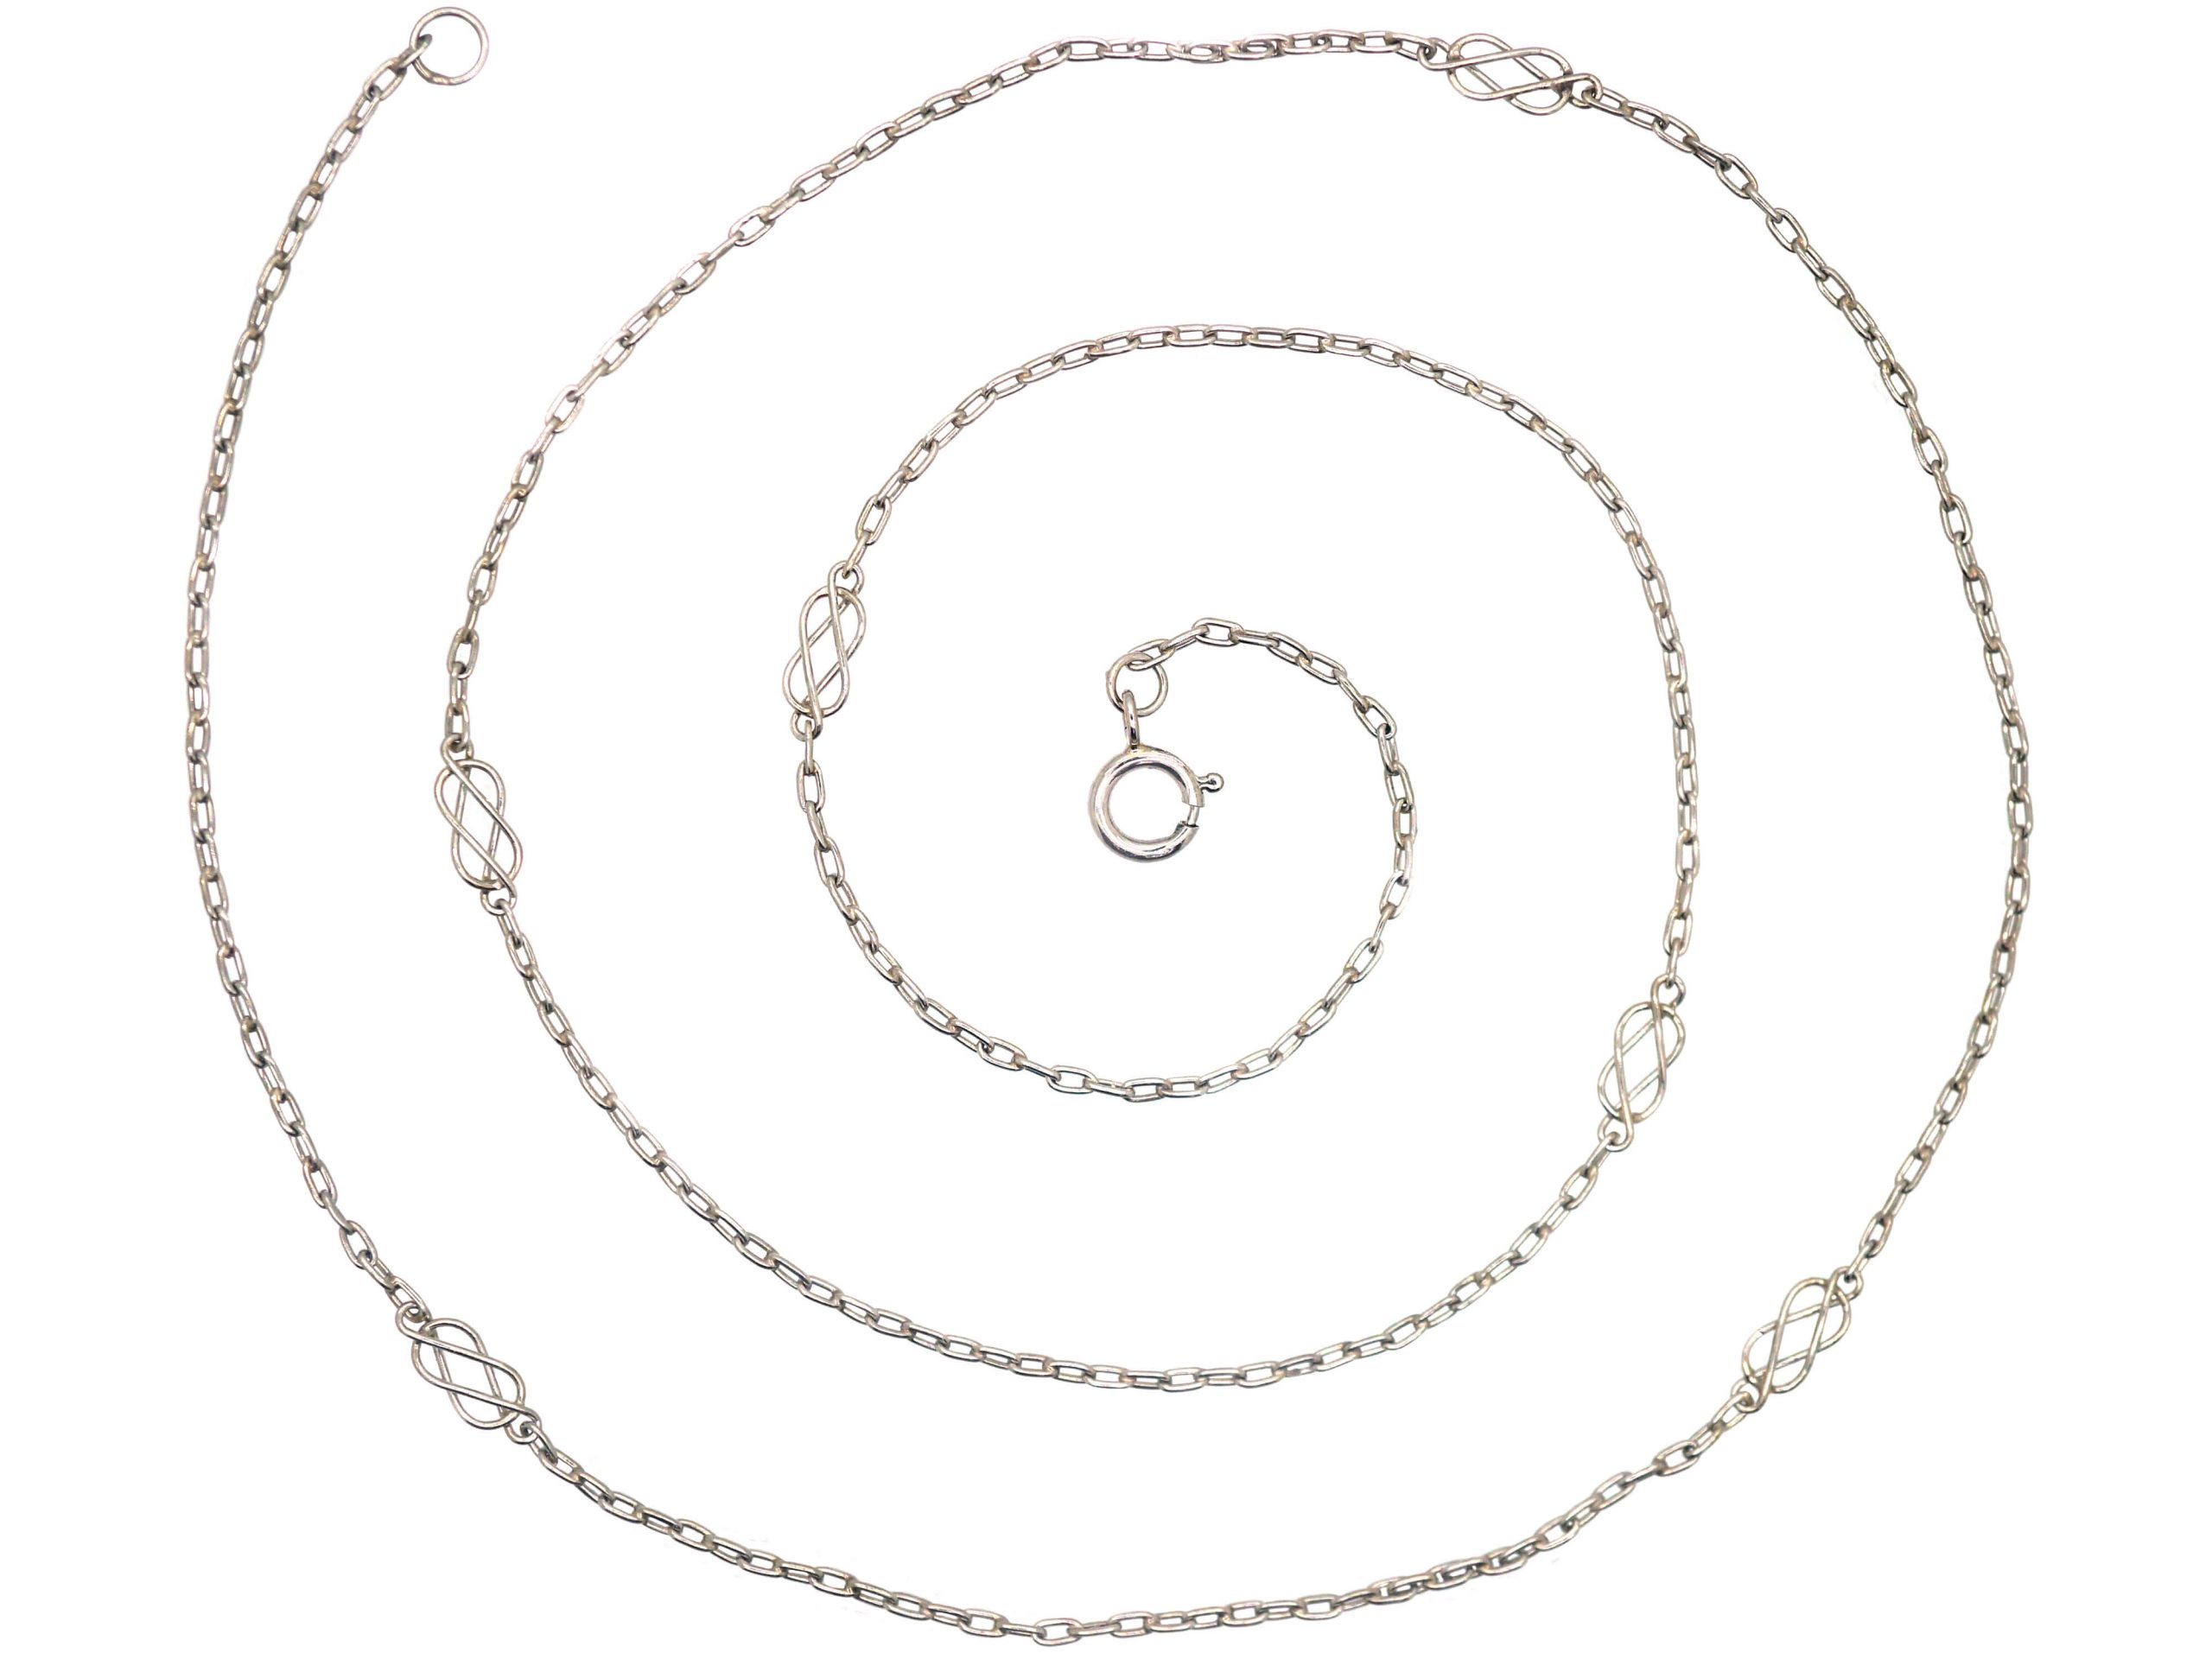 Edwardian Lover's Knot Platinum Chain